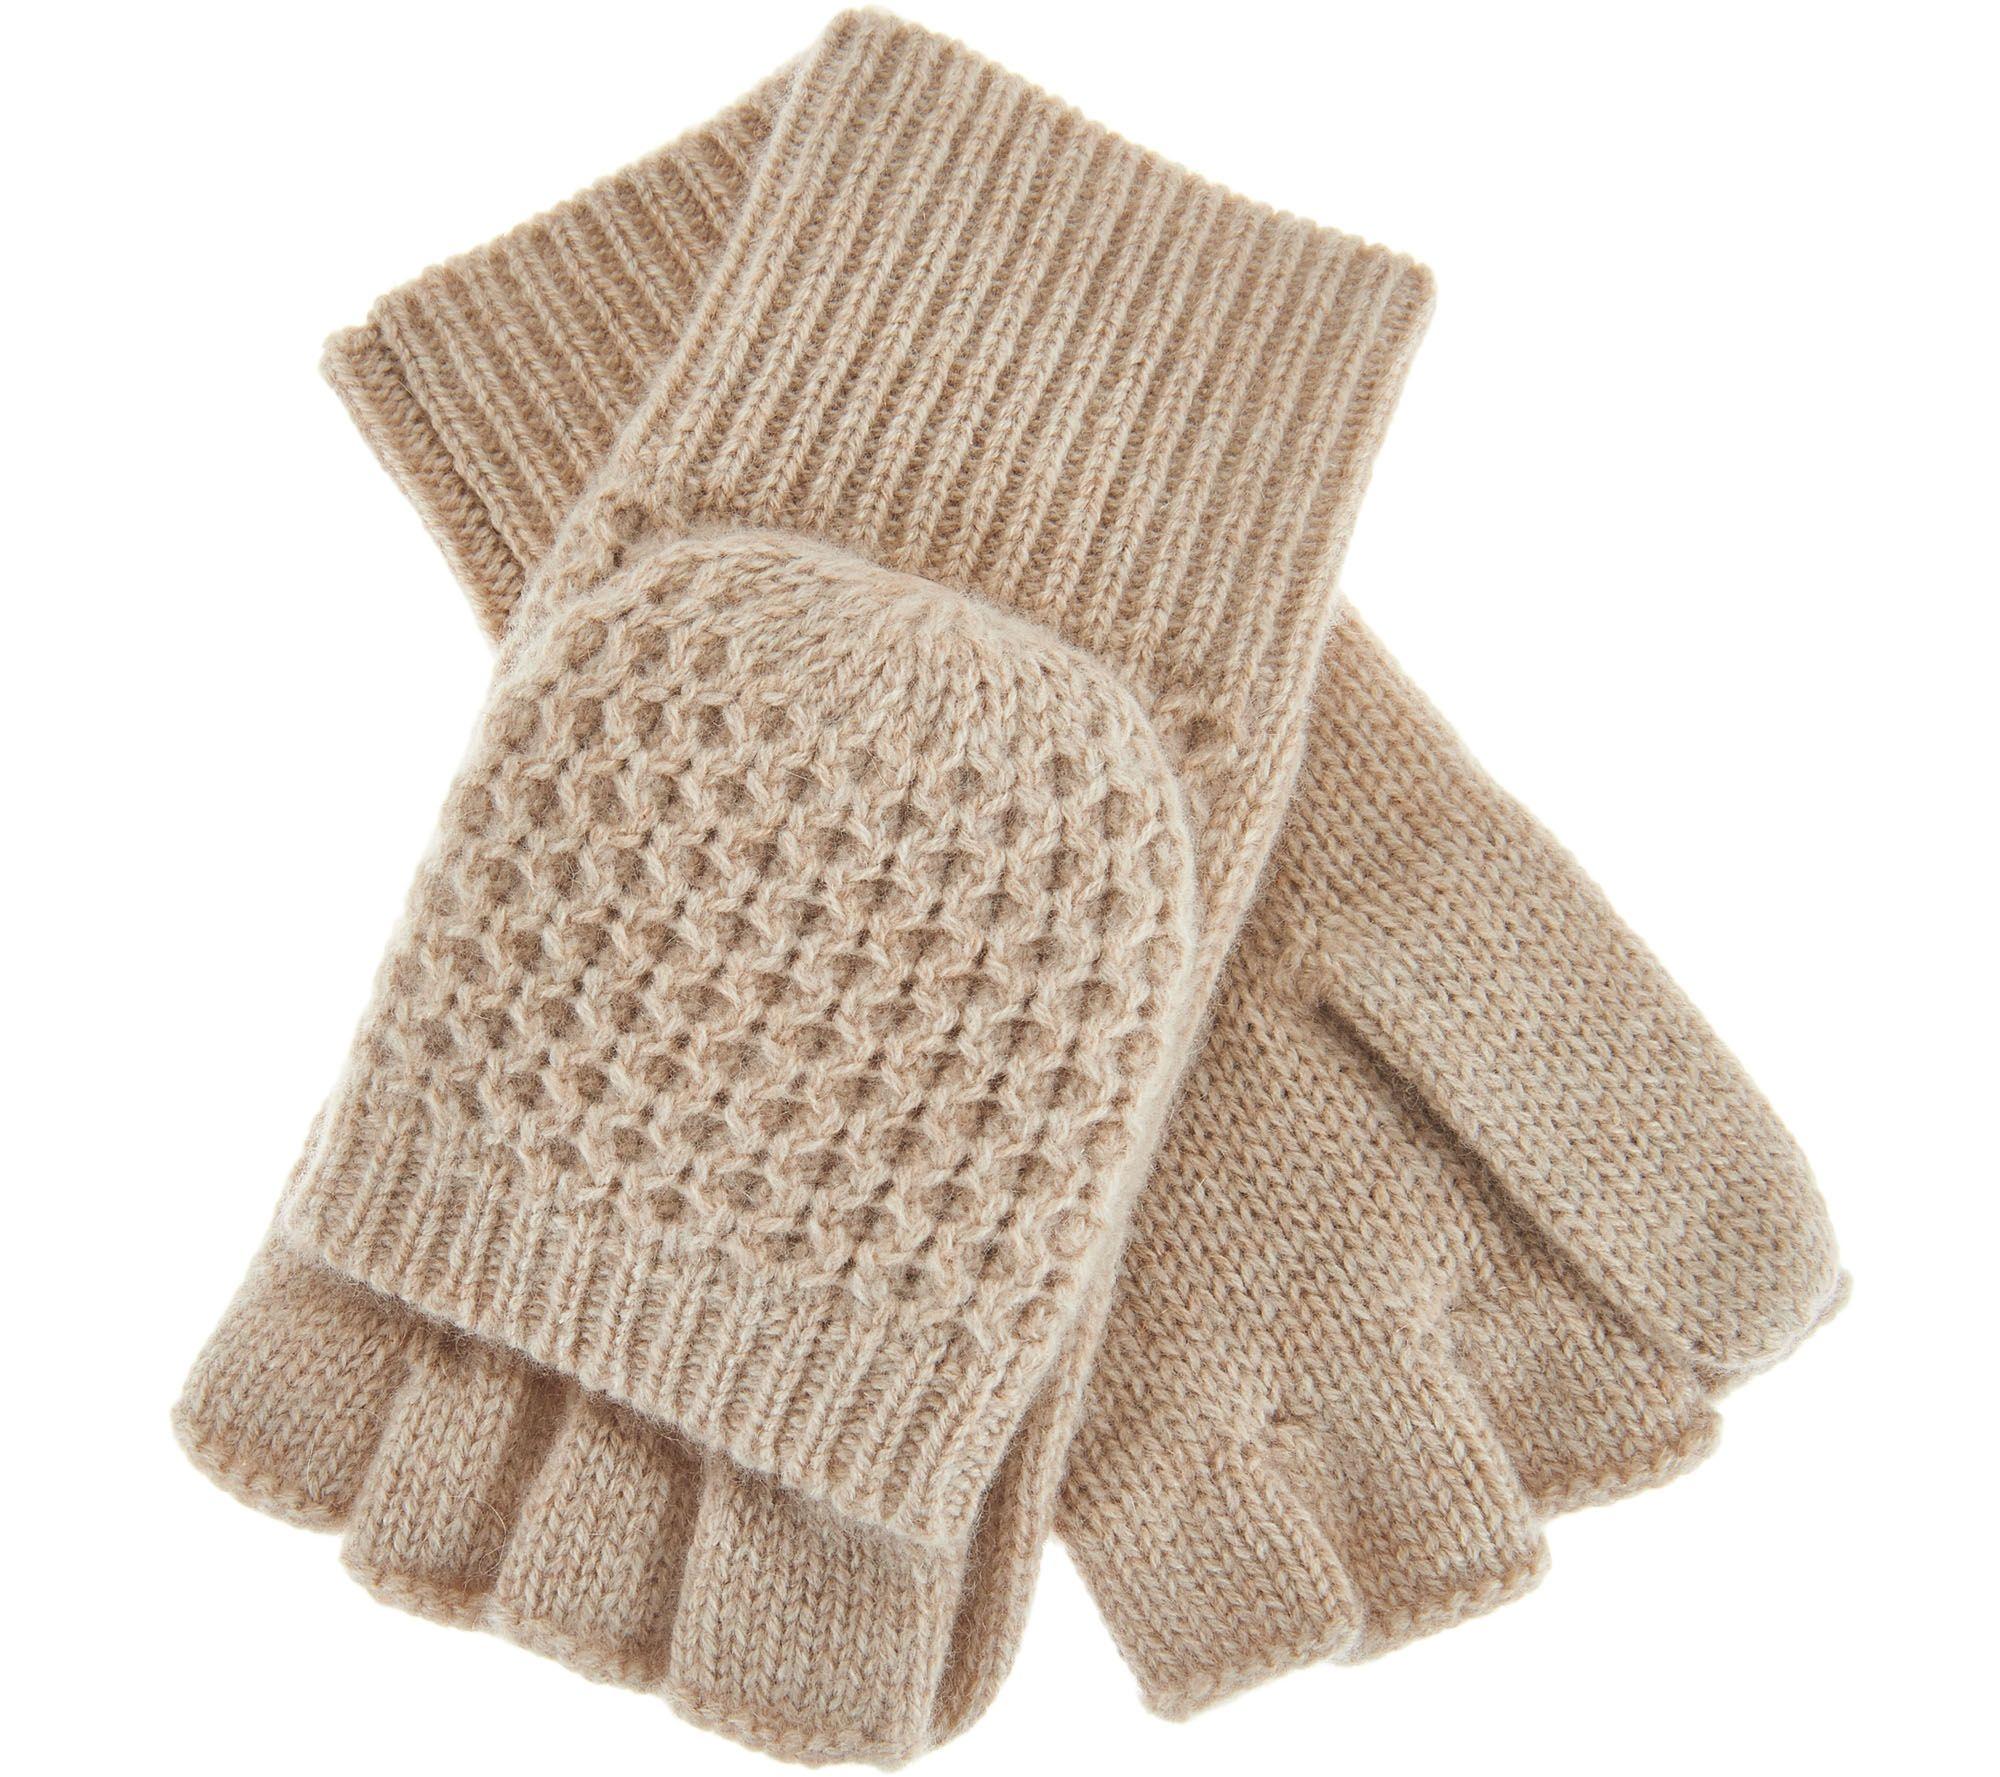 19cb2f09d78b8d Isaac Mizrahi Live! 2-Ply Cashmere Convertible Gloves - Page 1 — QVC.com